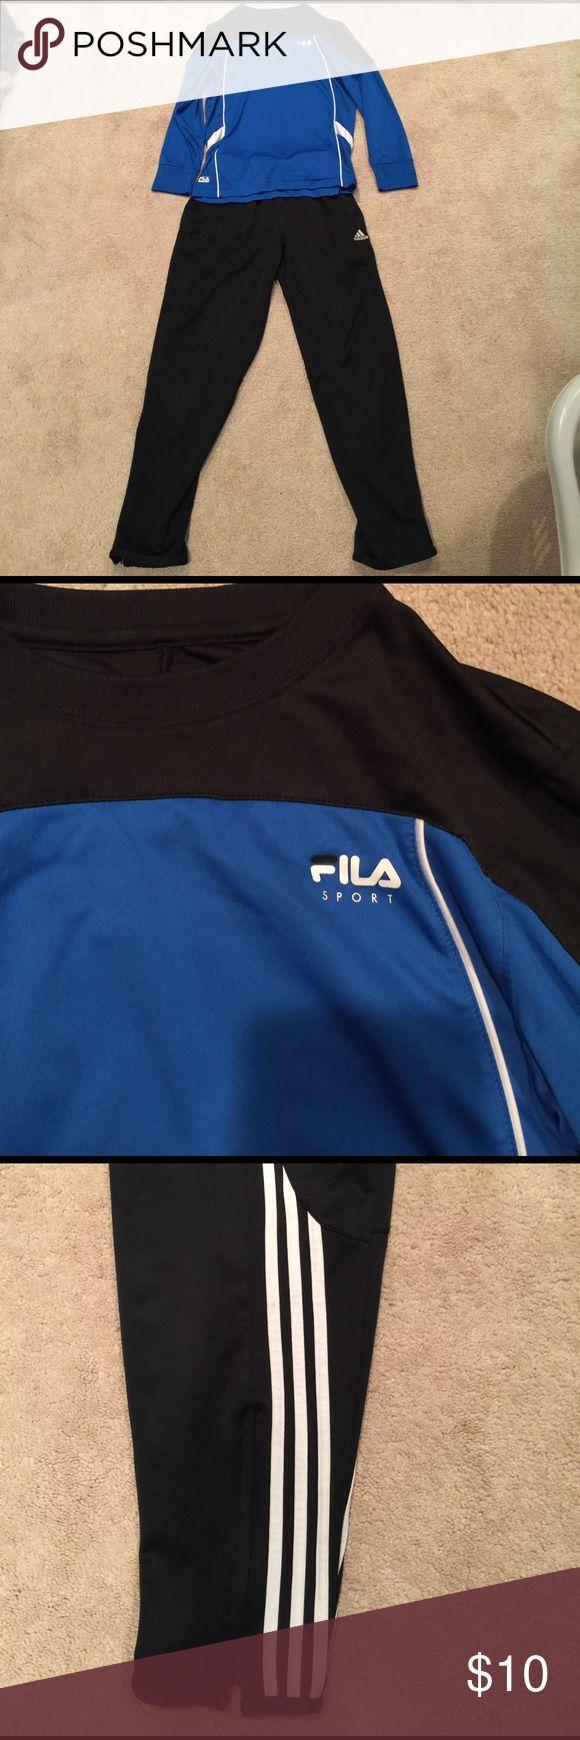 Boys Adidas Sweats and Long Sleeve Fila shirt Boys Adidas pants with Zipper bottom, size medium and FIla long sleeve shirt, size Medium Adidas Bottoms Sweatpants & Joggers